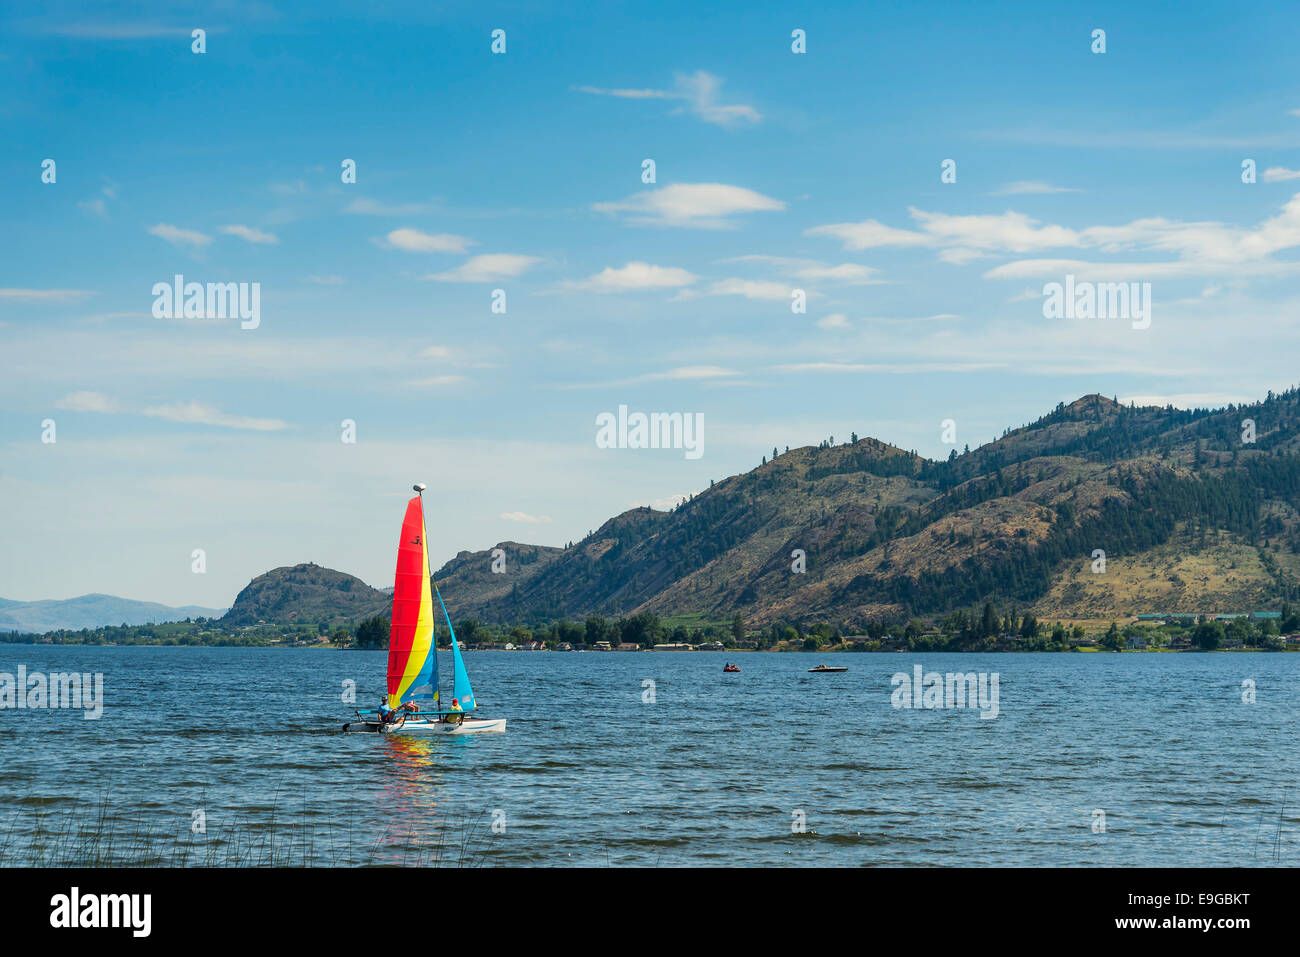 Catamaran sailboat on Osoyoos Lake, Osoyoos, ,  British Columbia, Canada - Stock Image